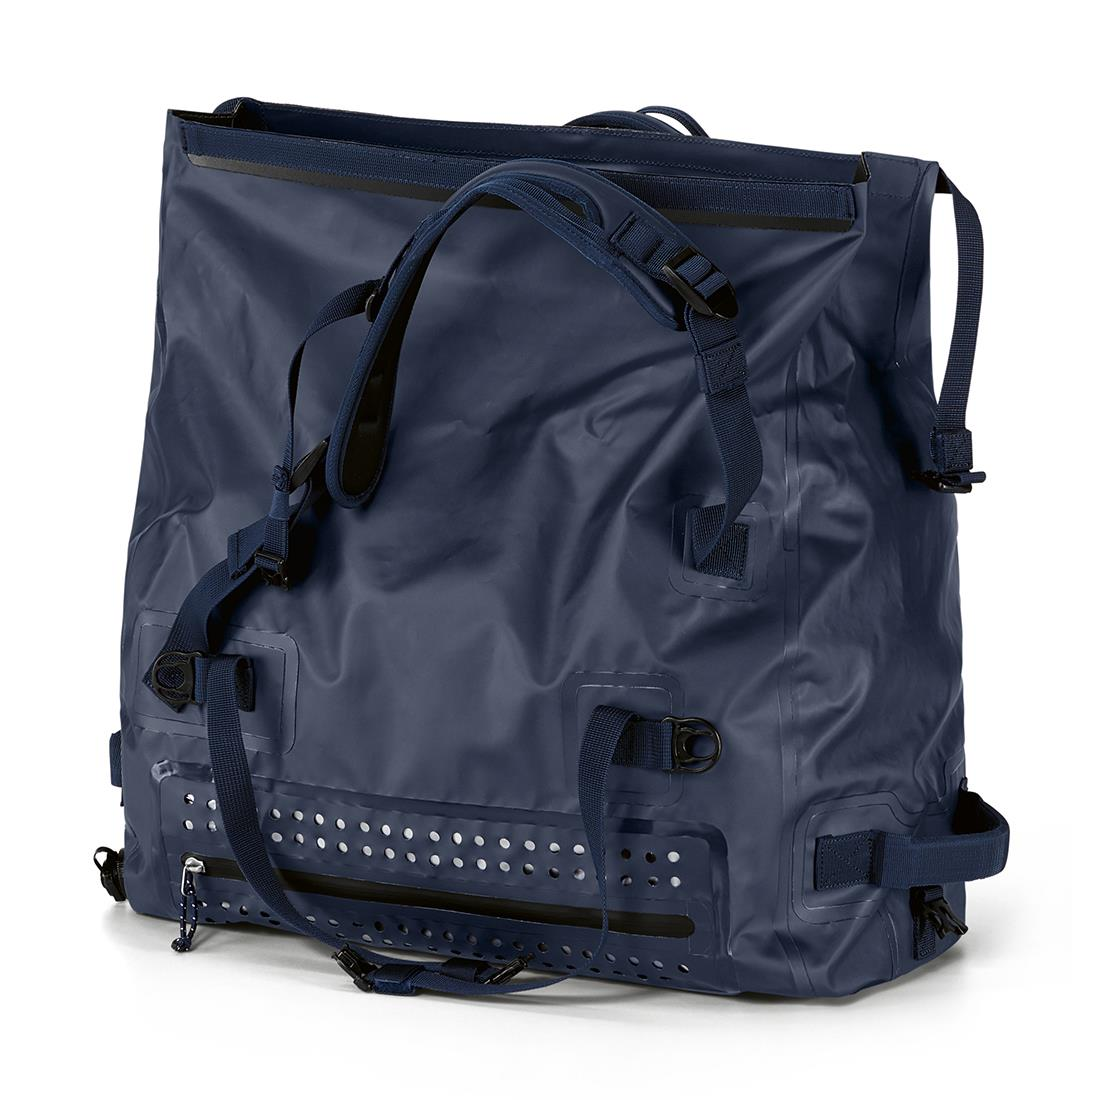 BMW Yachtsport Functional Bag